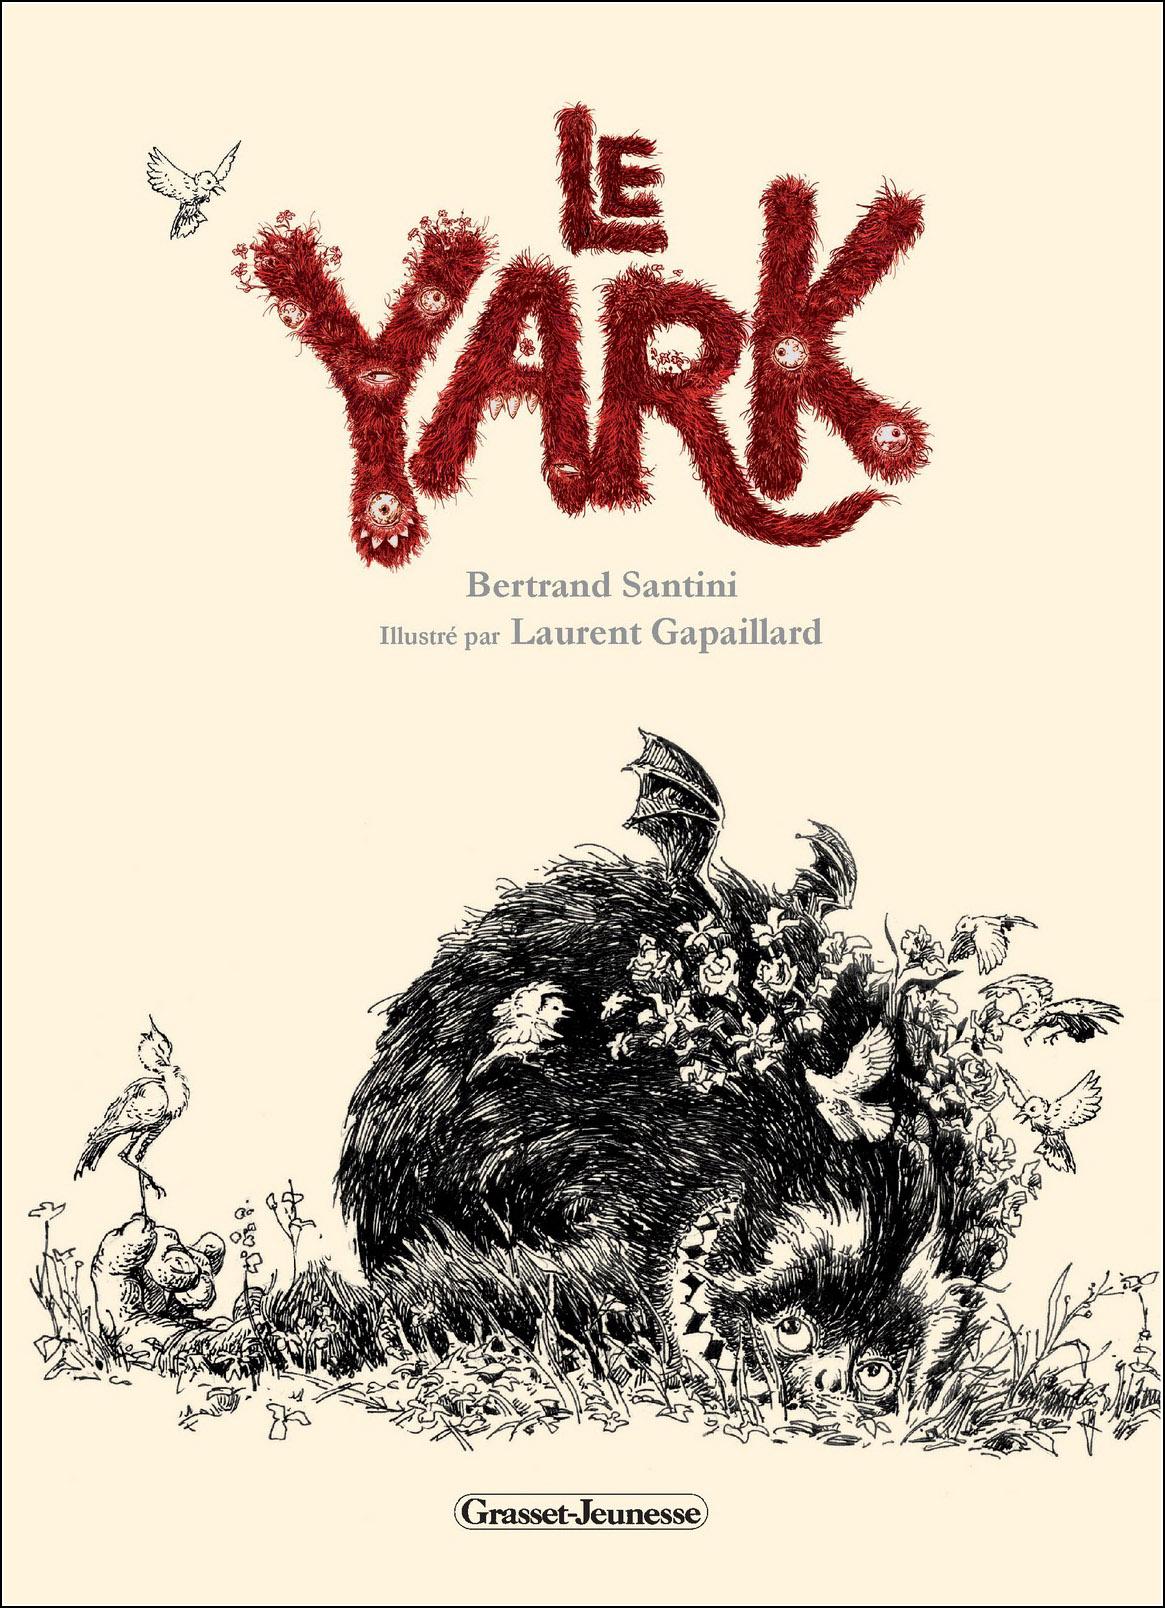 Laurent Gapaillard, Le Yark